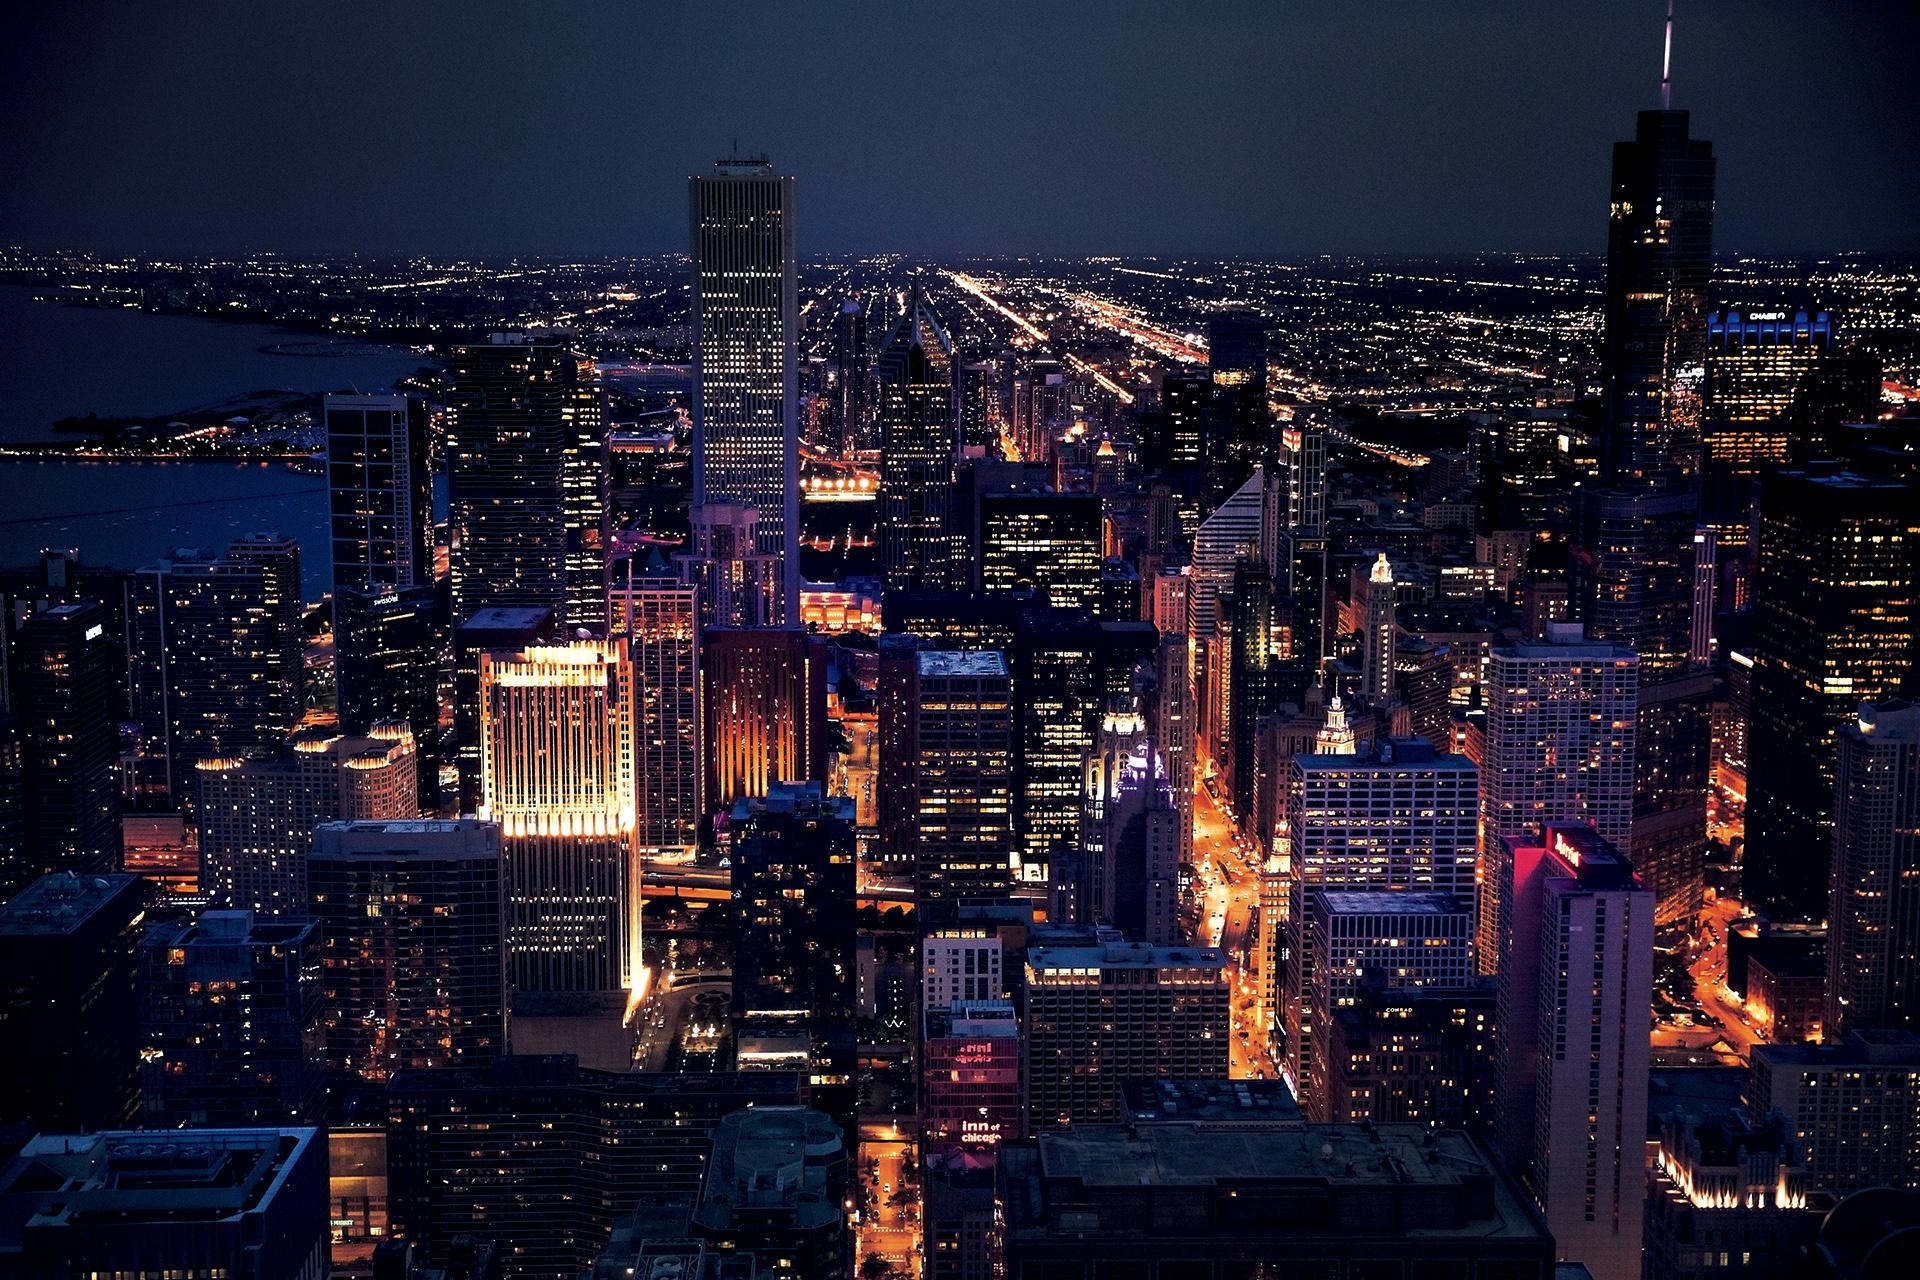 chicagoskyline_print_smallrgb.jpg